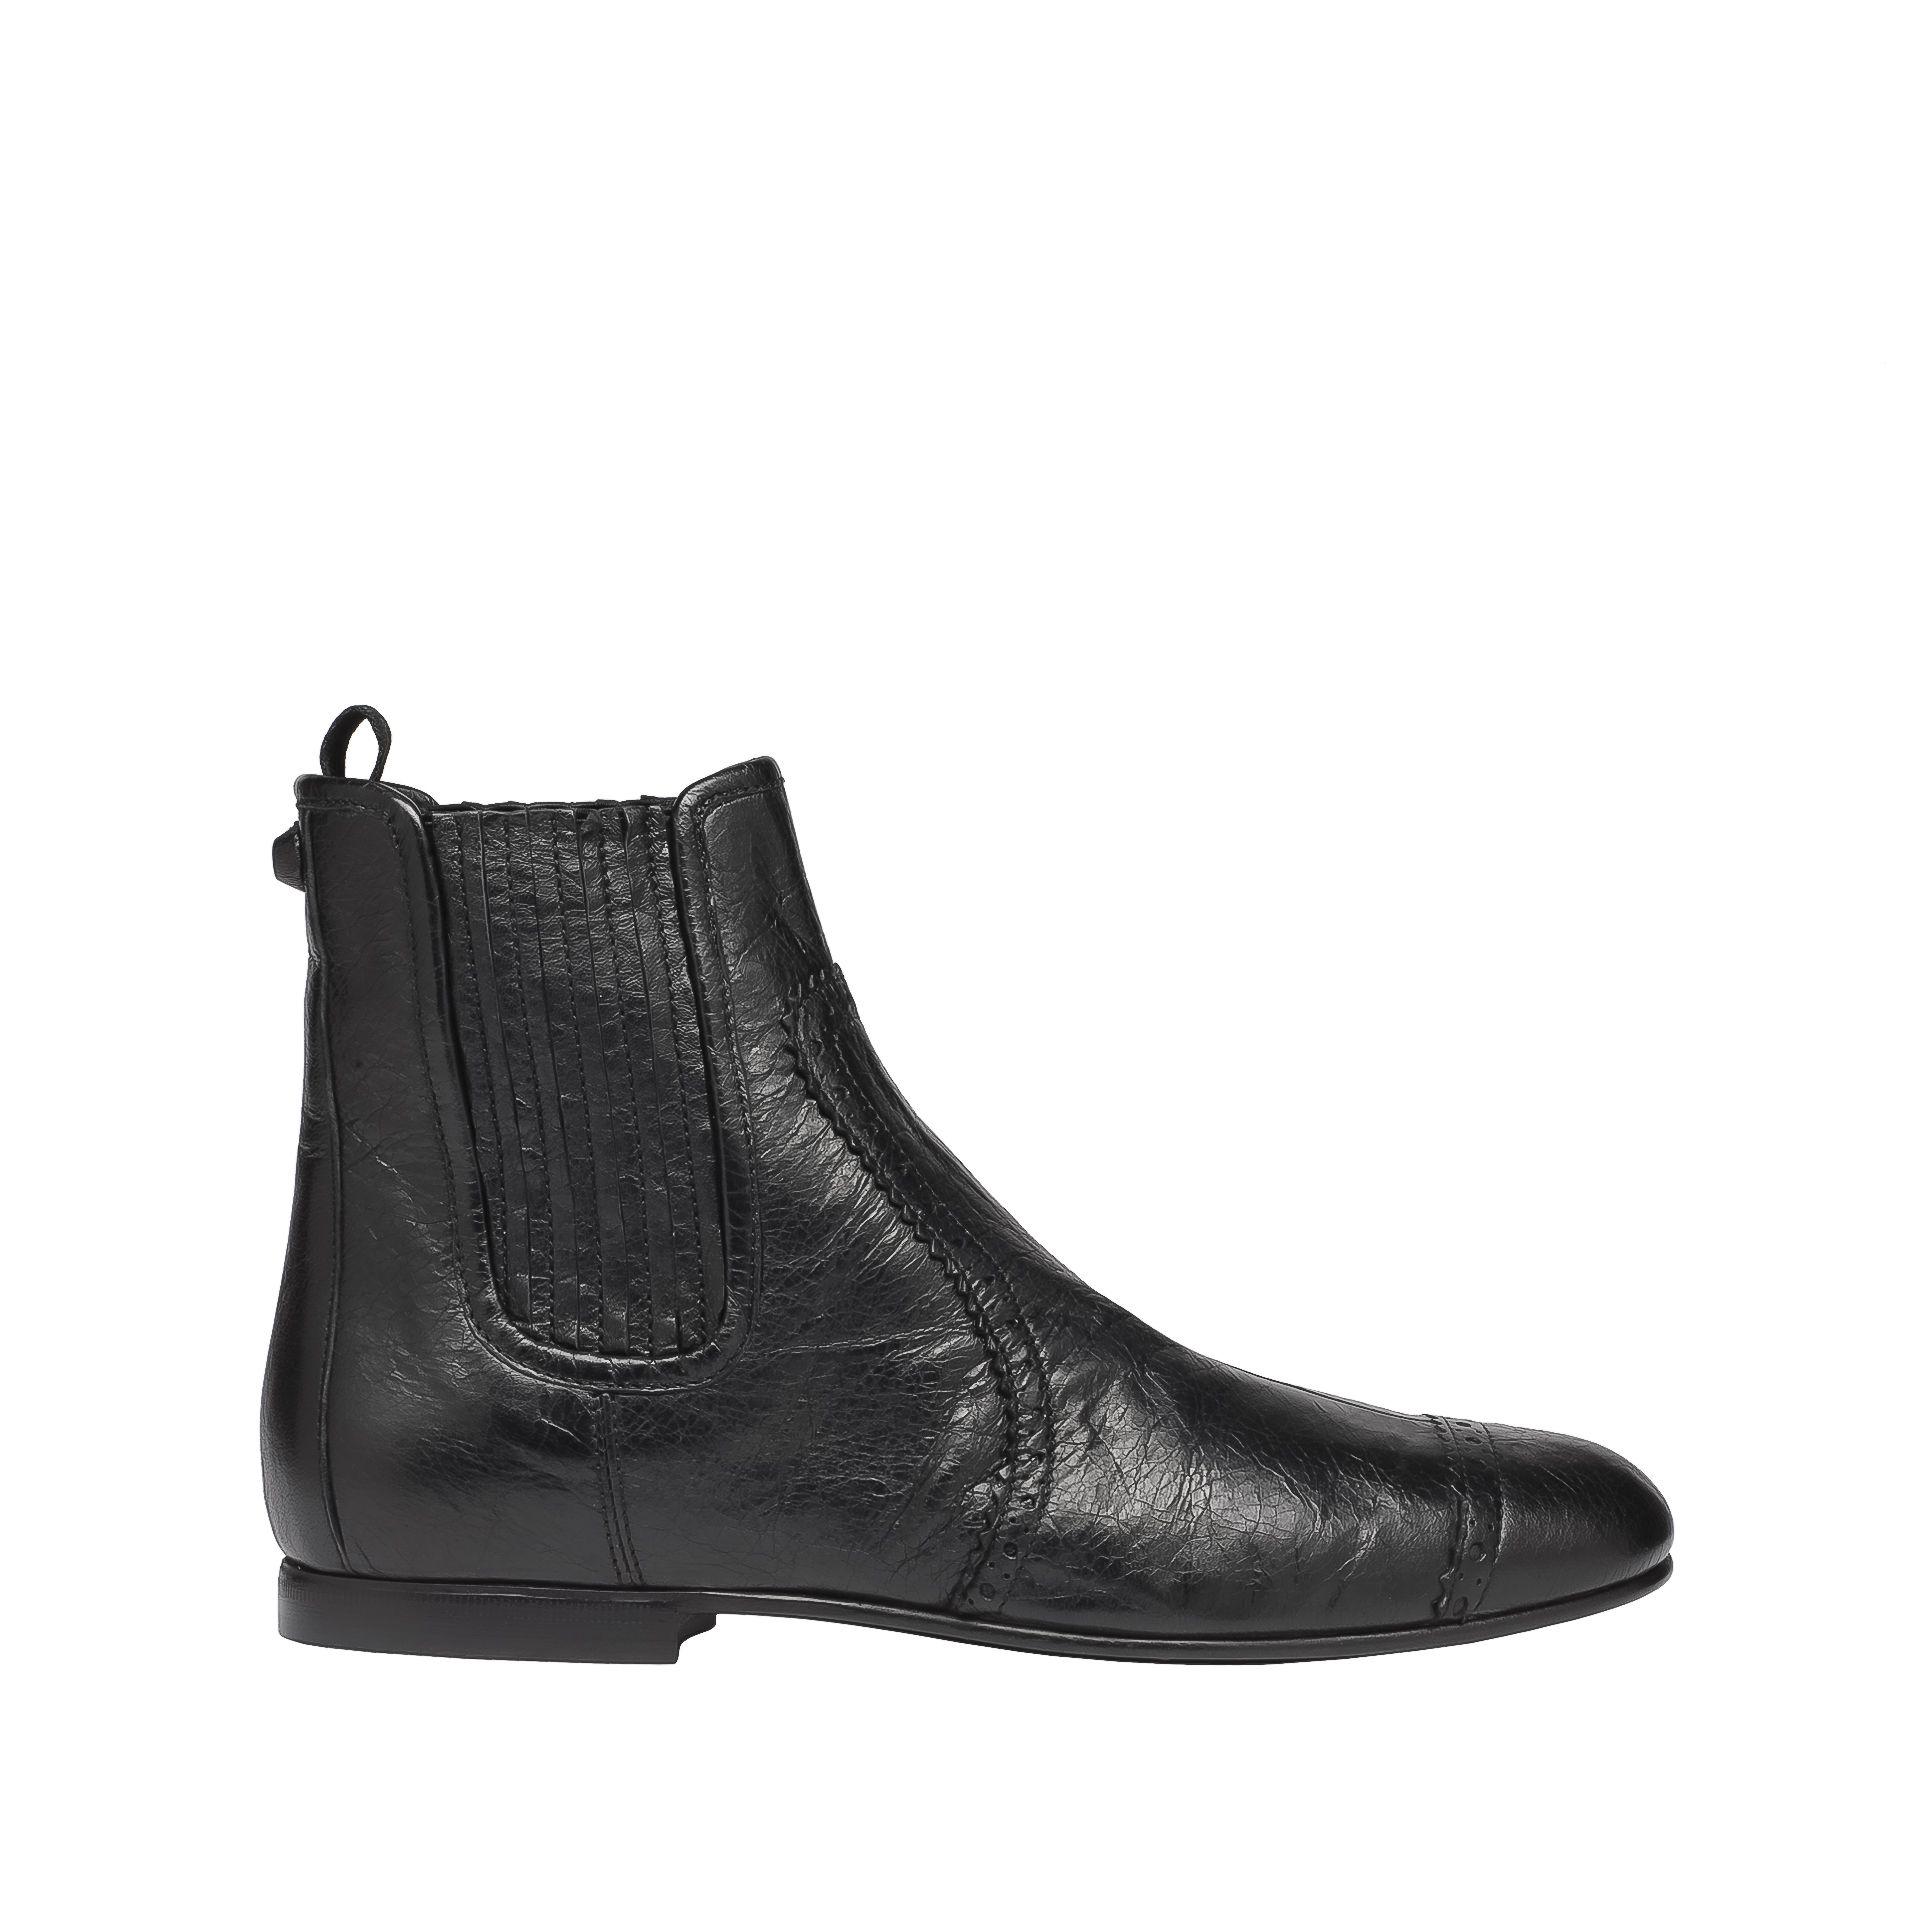 BALENCIAGA Balenciaga Brogues Ankle Boots Ankle boot D f